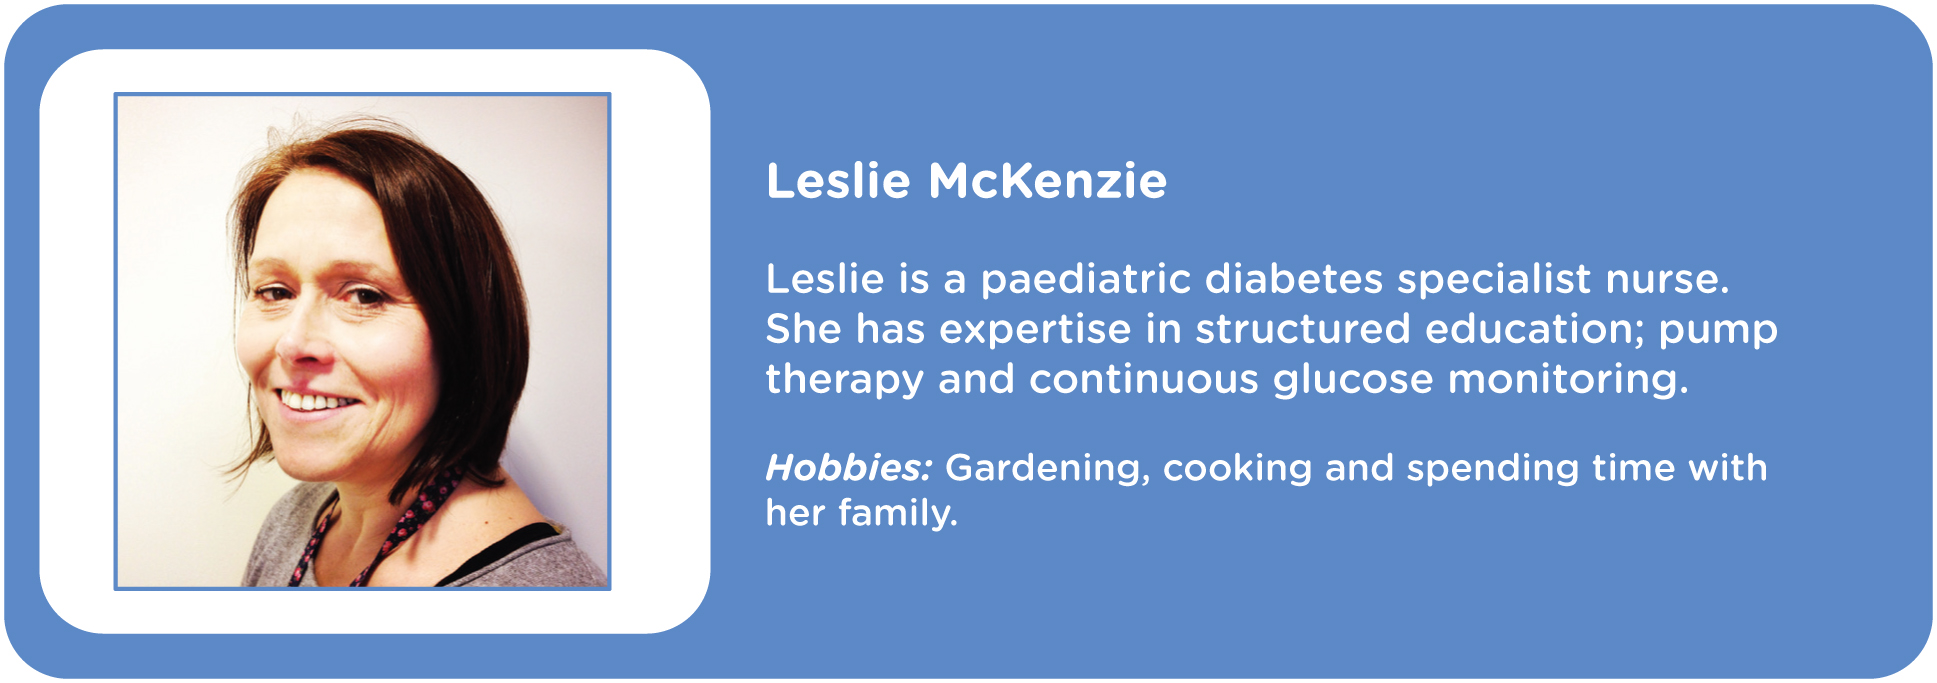 Leslie McKenzie